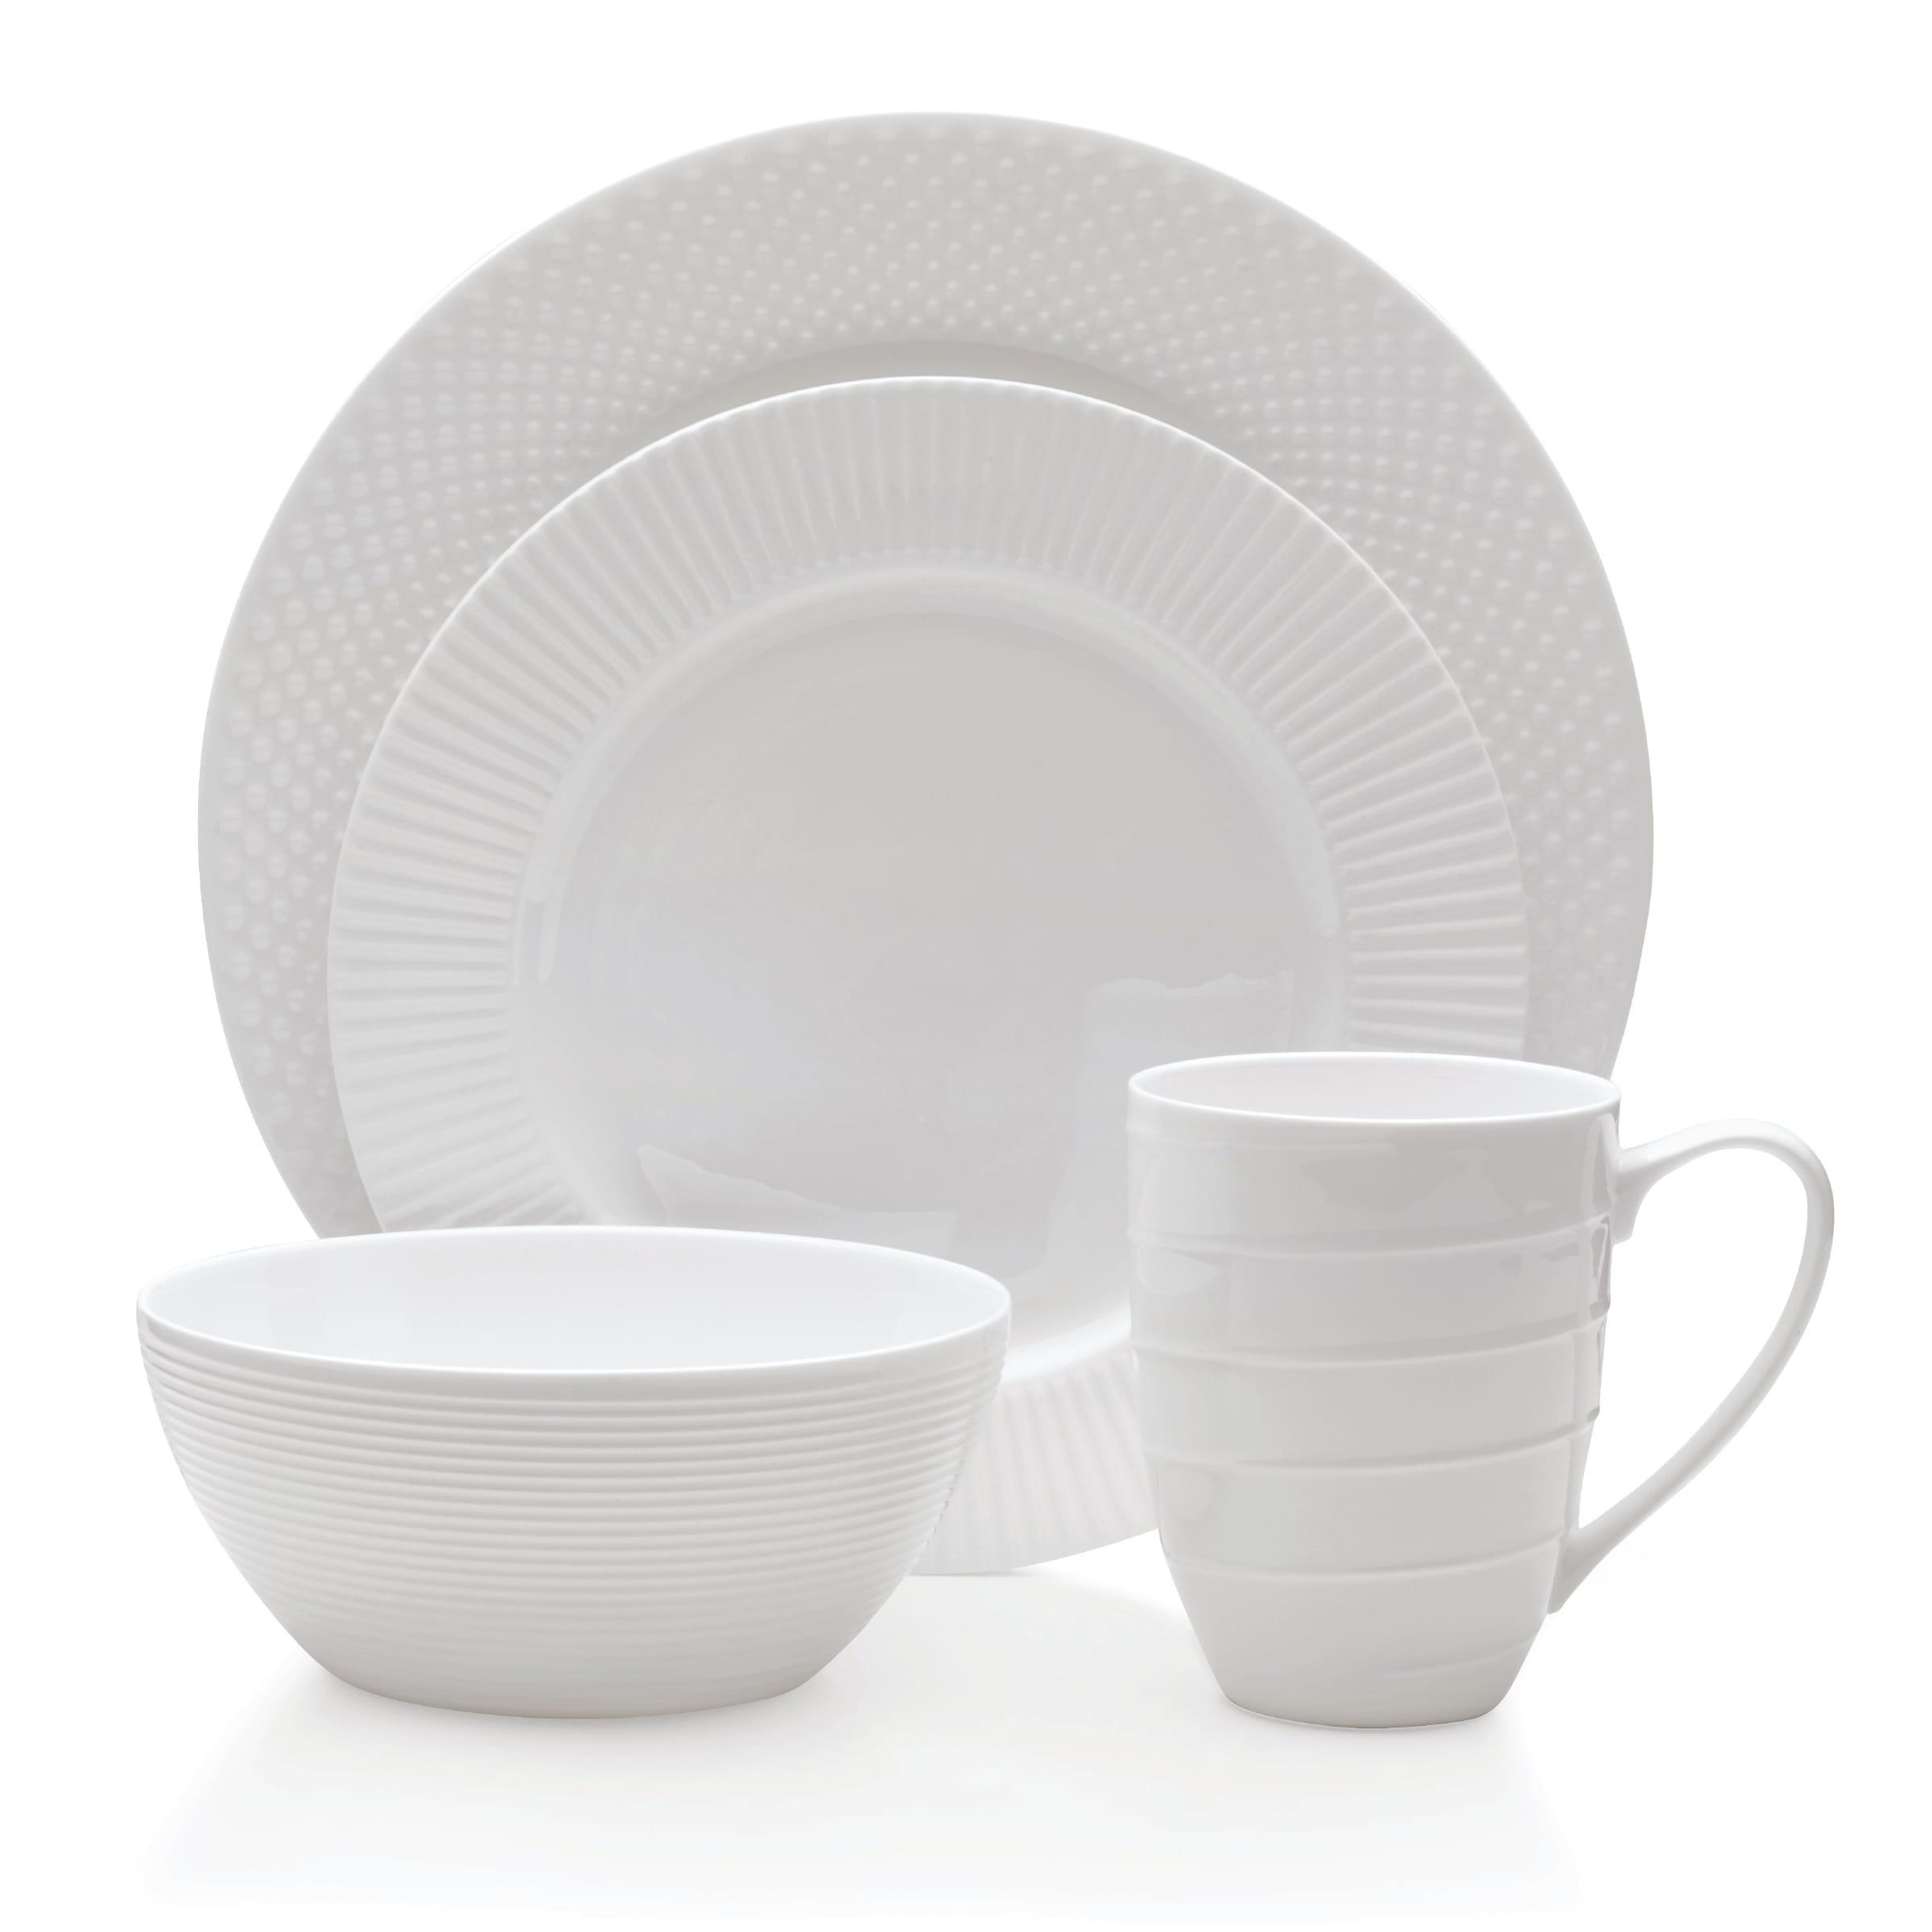 Asian Linen 16-Pc Dinnerware Set - Hairy - Fromtheinsideoutus-7408